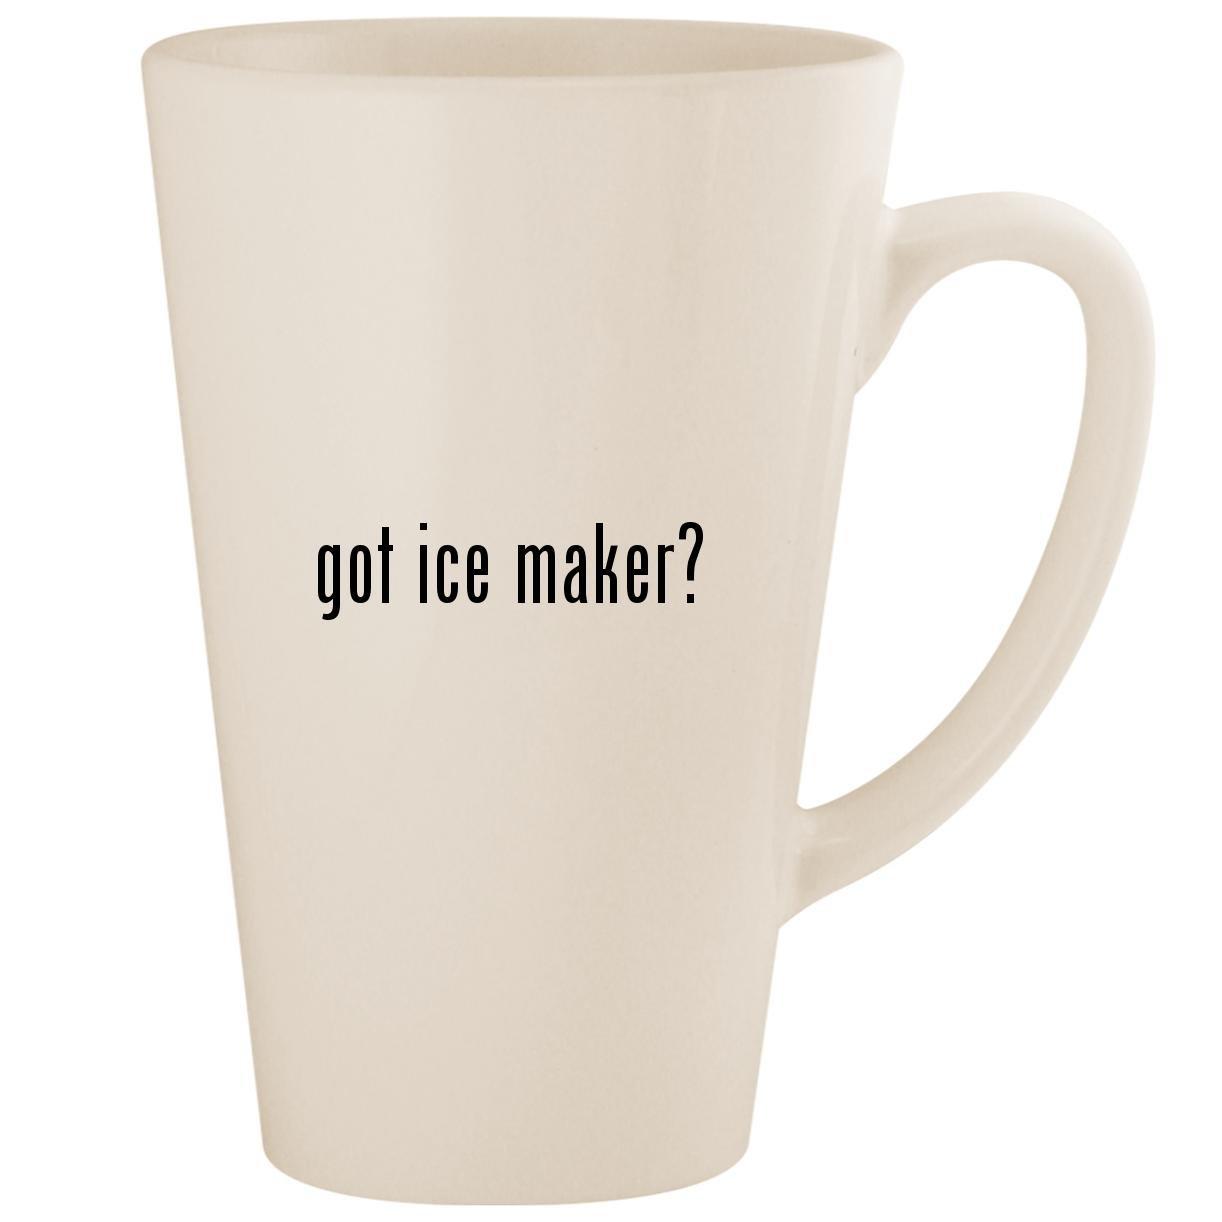 got ice maker? - White 17oz Ceramic Latte Mug Cup